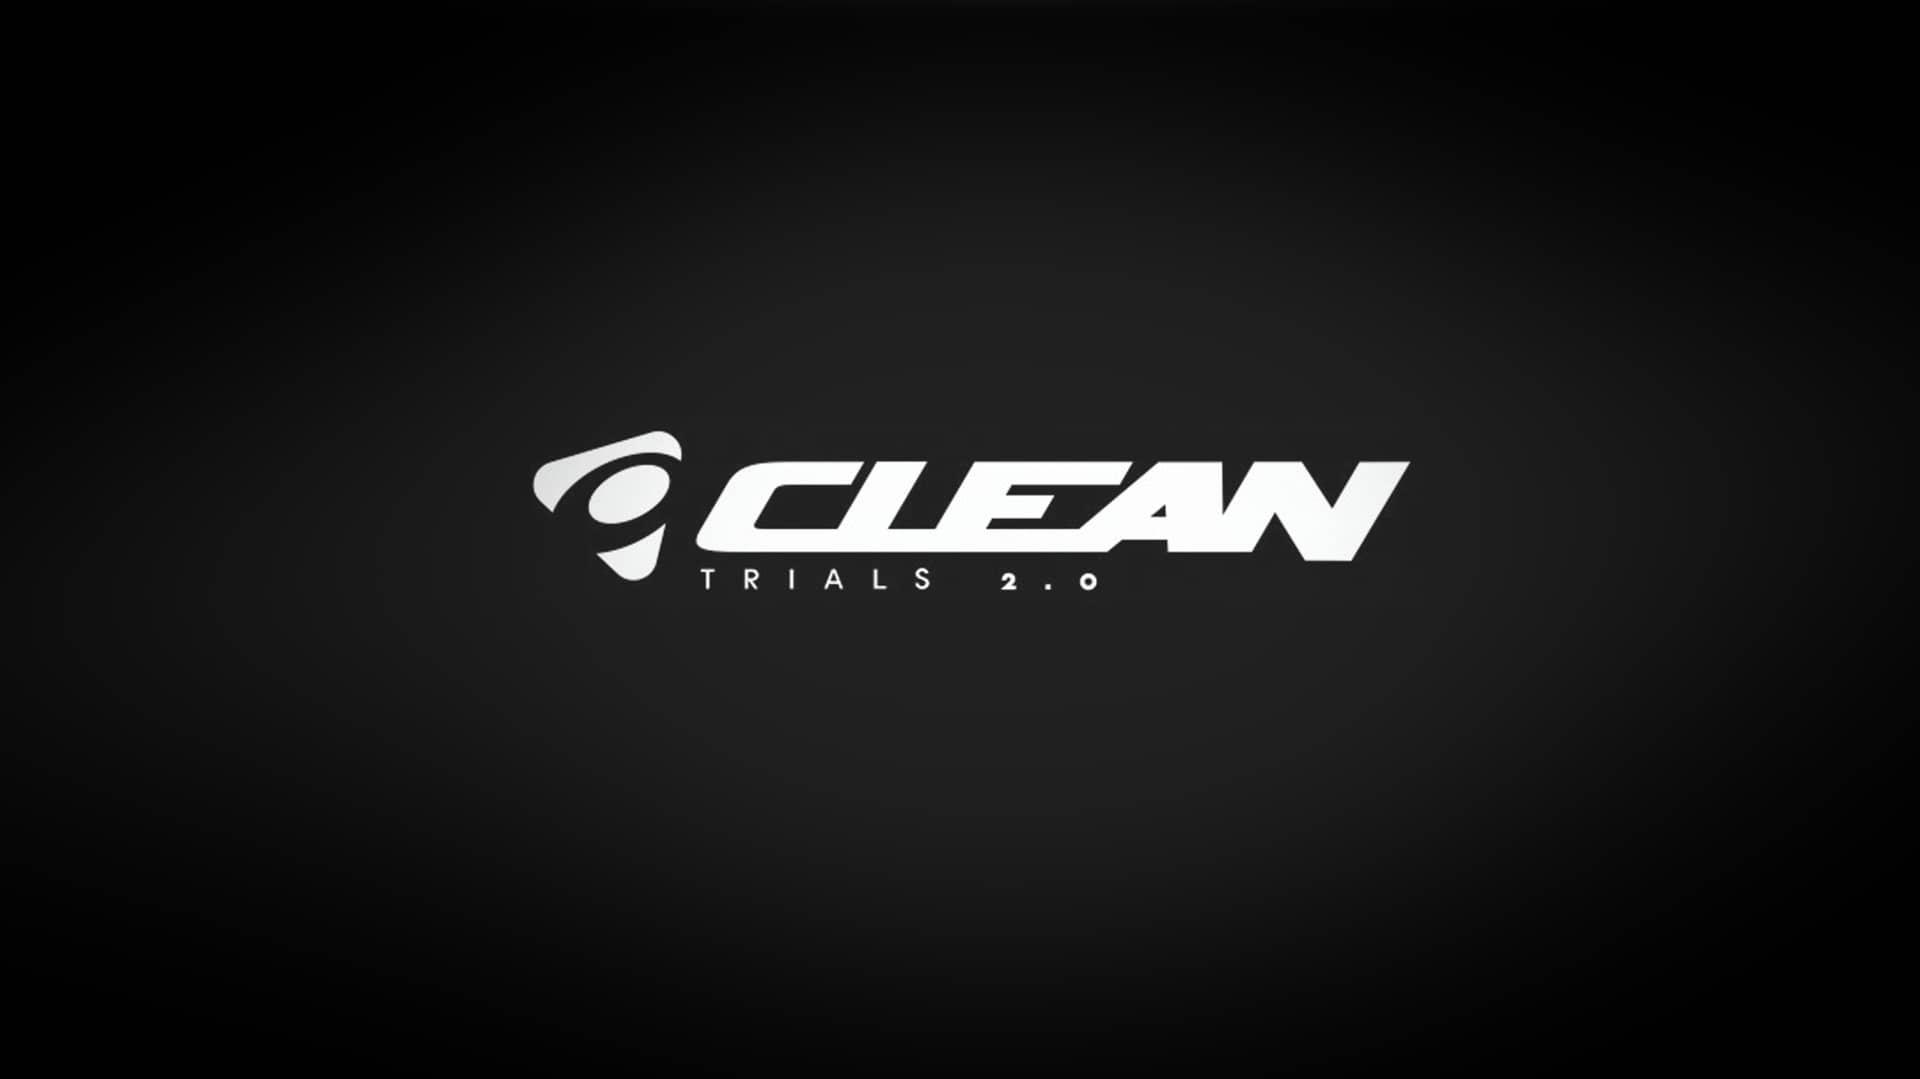 Clean - поступление компонентов на склад